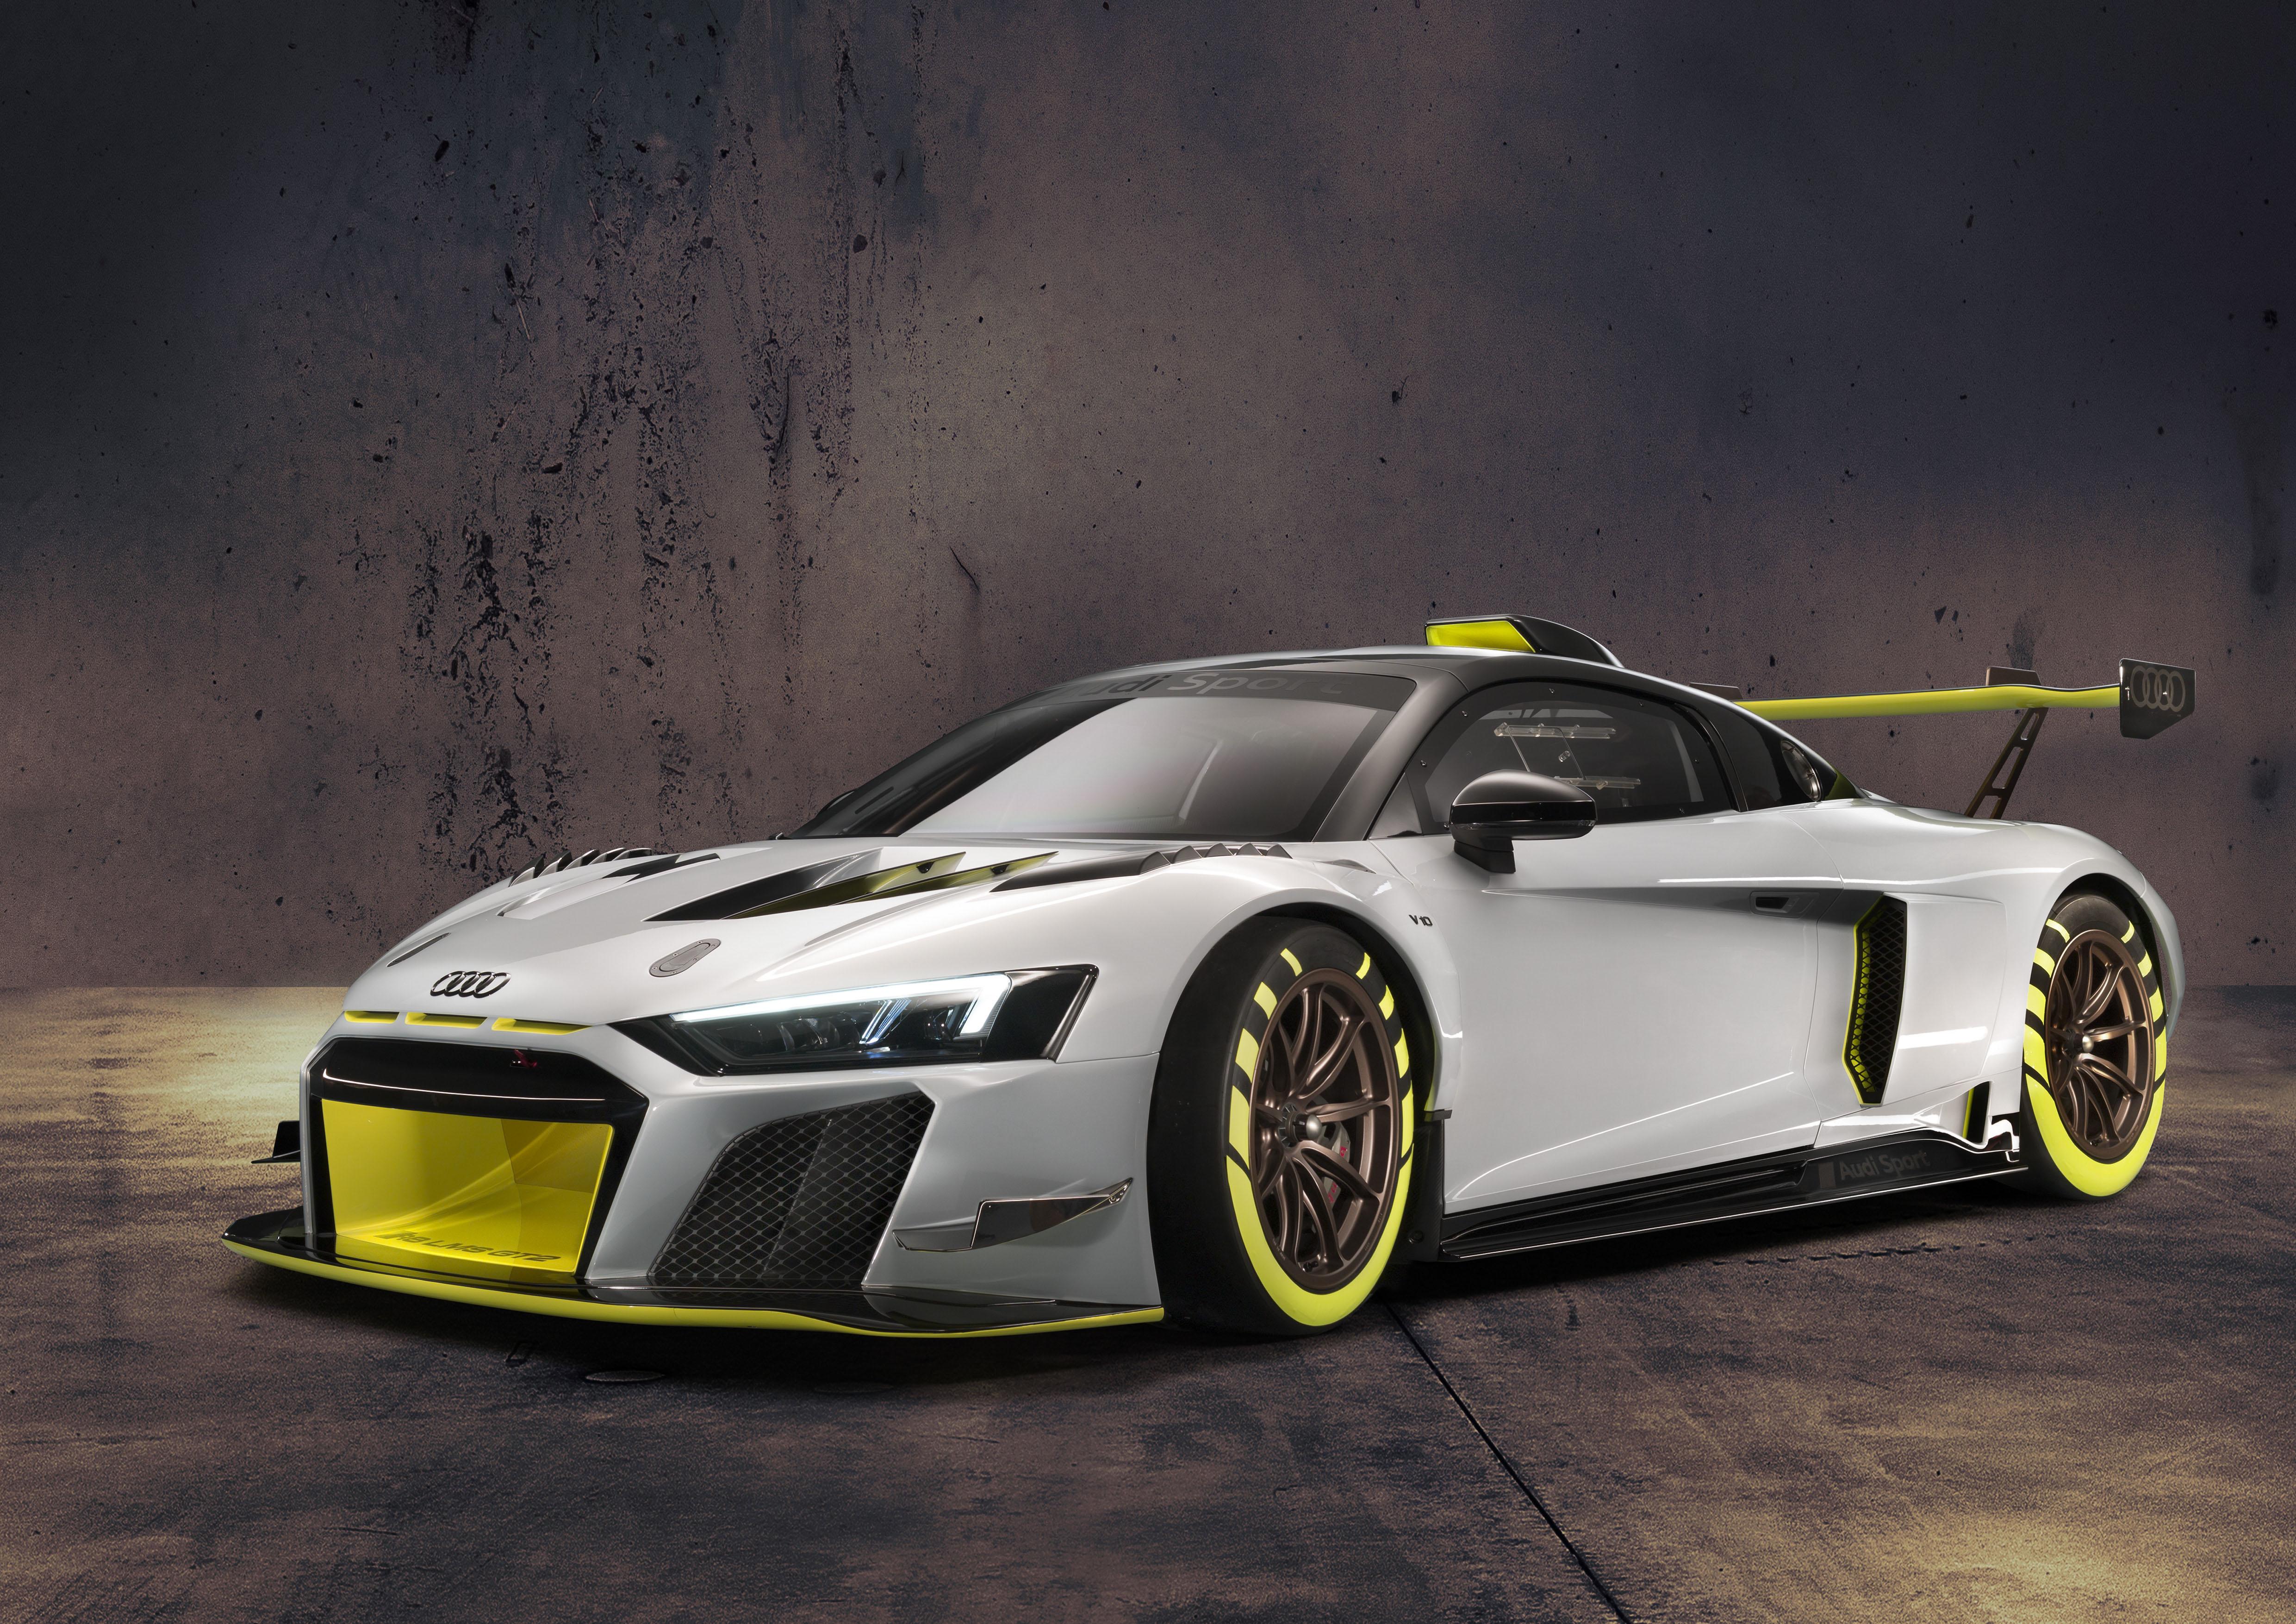 2020 Audi R8 LMS GT2 4k Ultra HD Wallpaper | Background ...